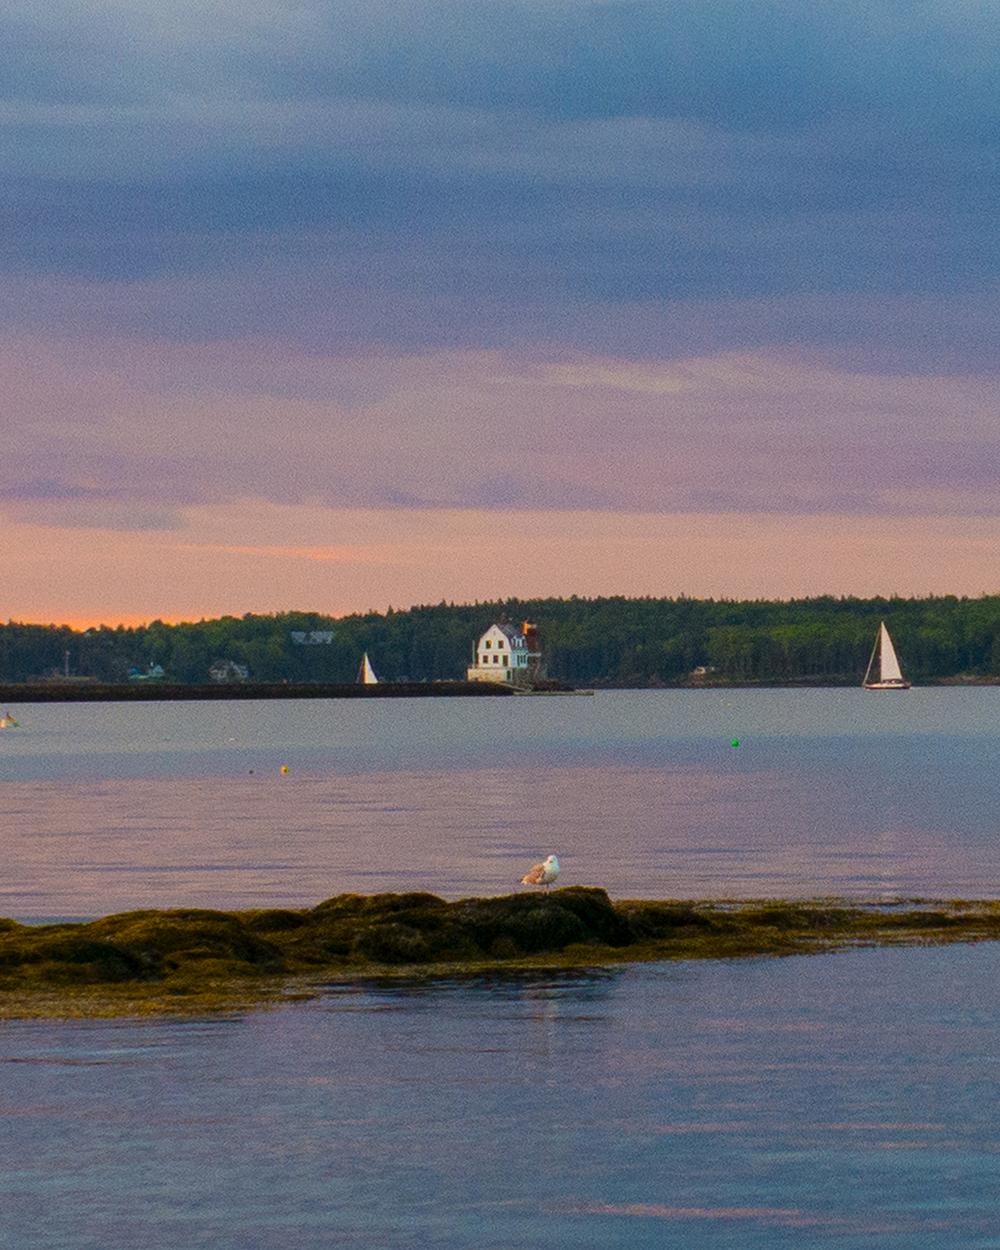 Rockland Breakwater&2 sails_1000.jpg